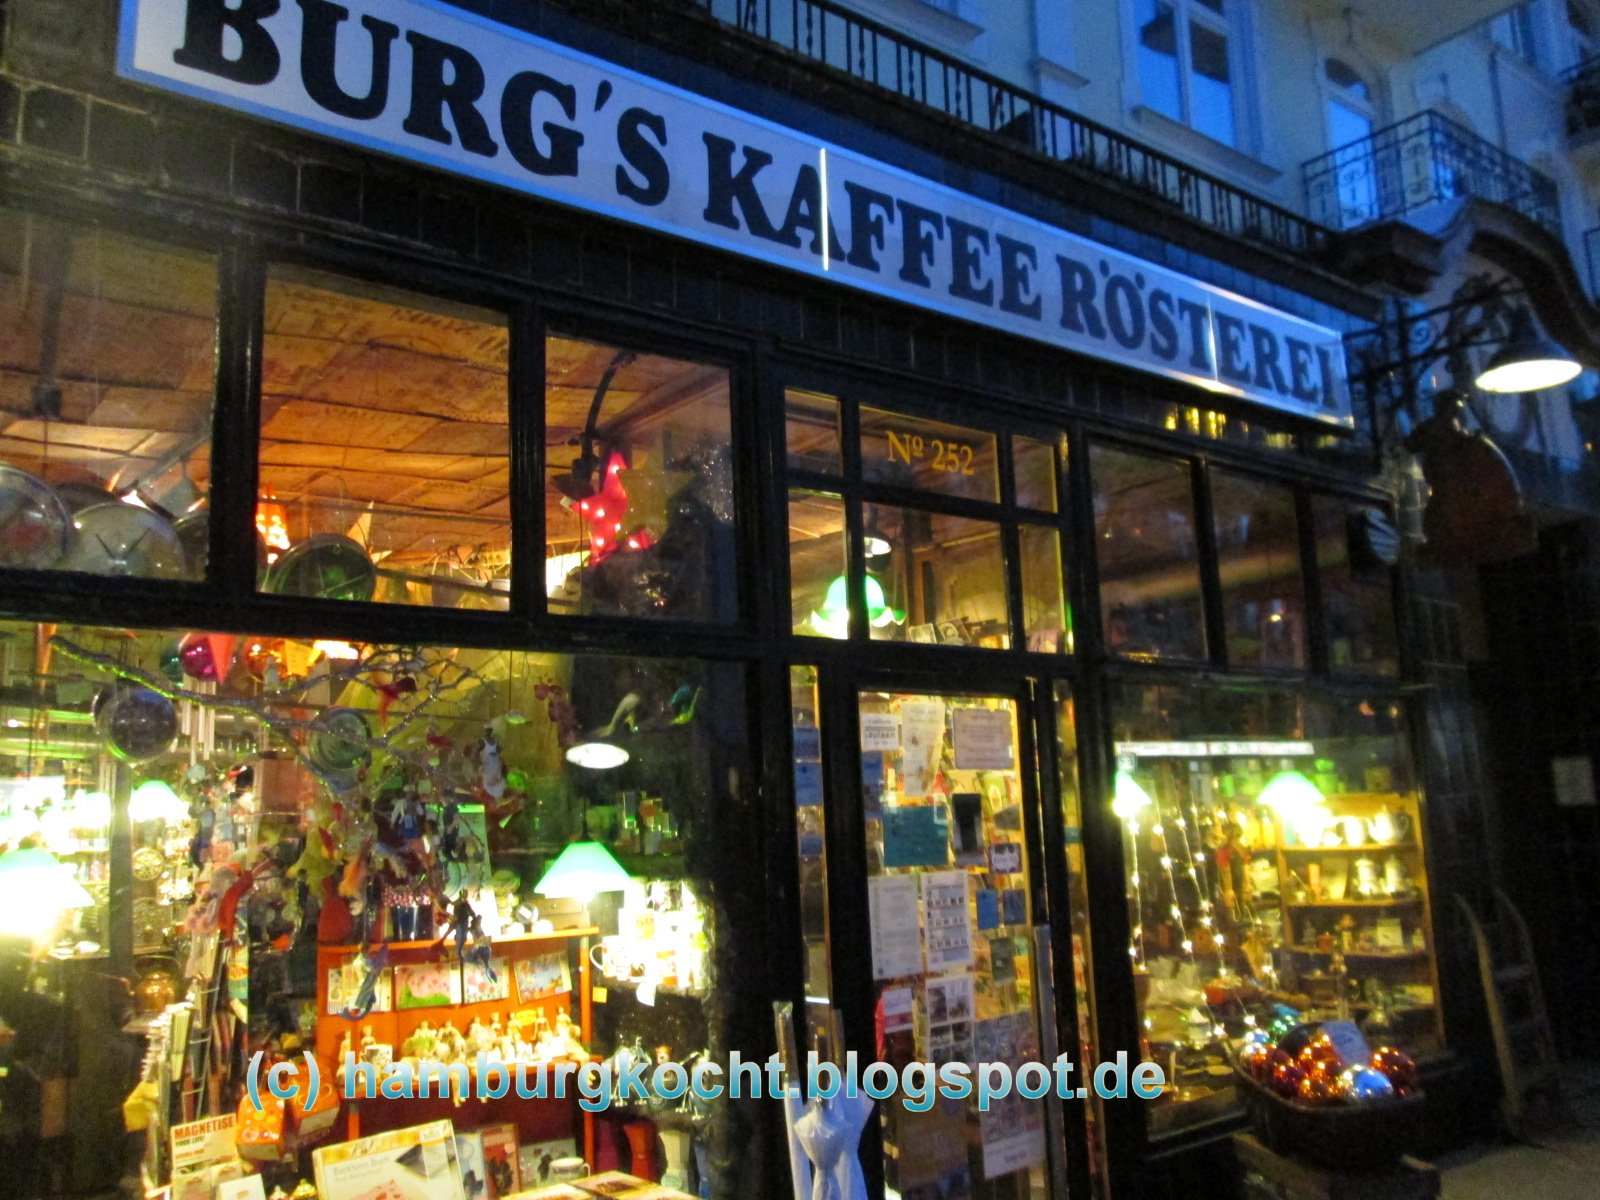 hamburg kocht burg 39 s kaffeer sterei in eppendorf. Black Bedroom Furniture Sets. Home Design Ideas